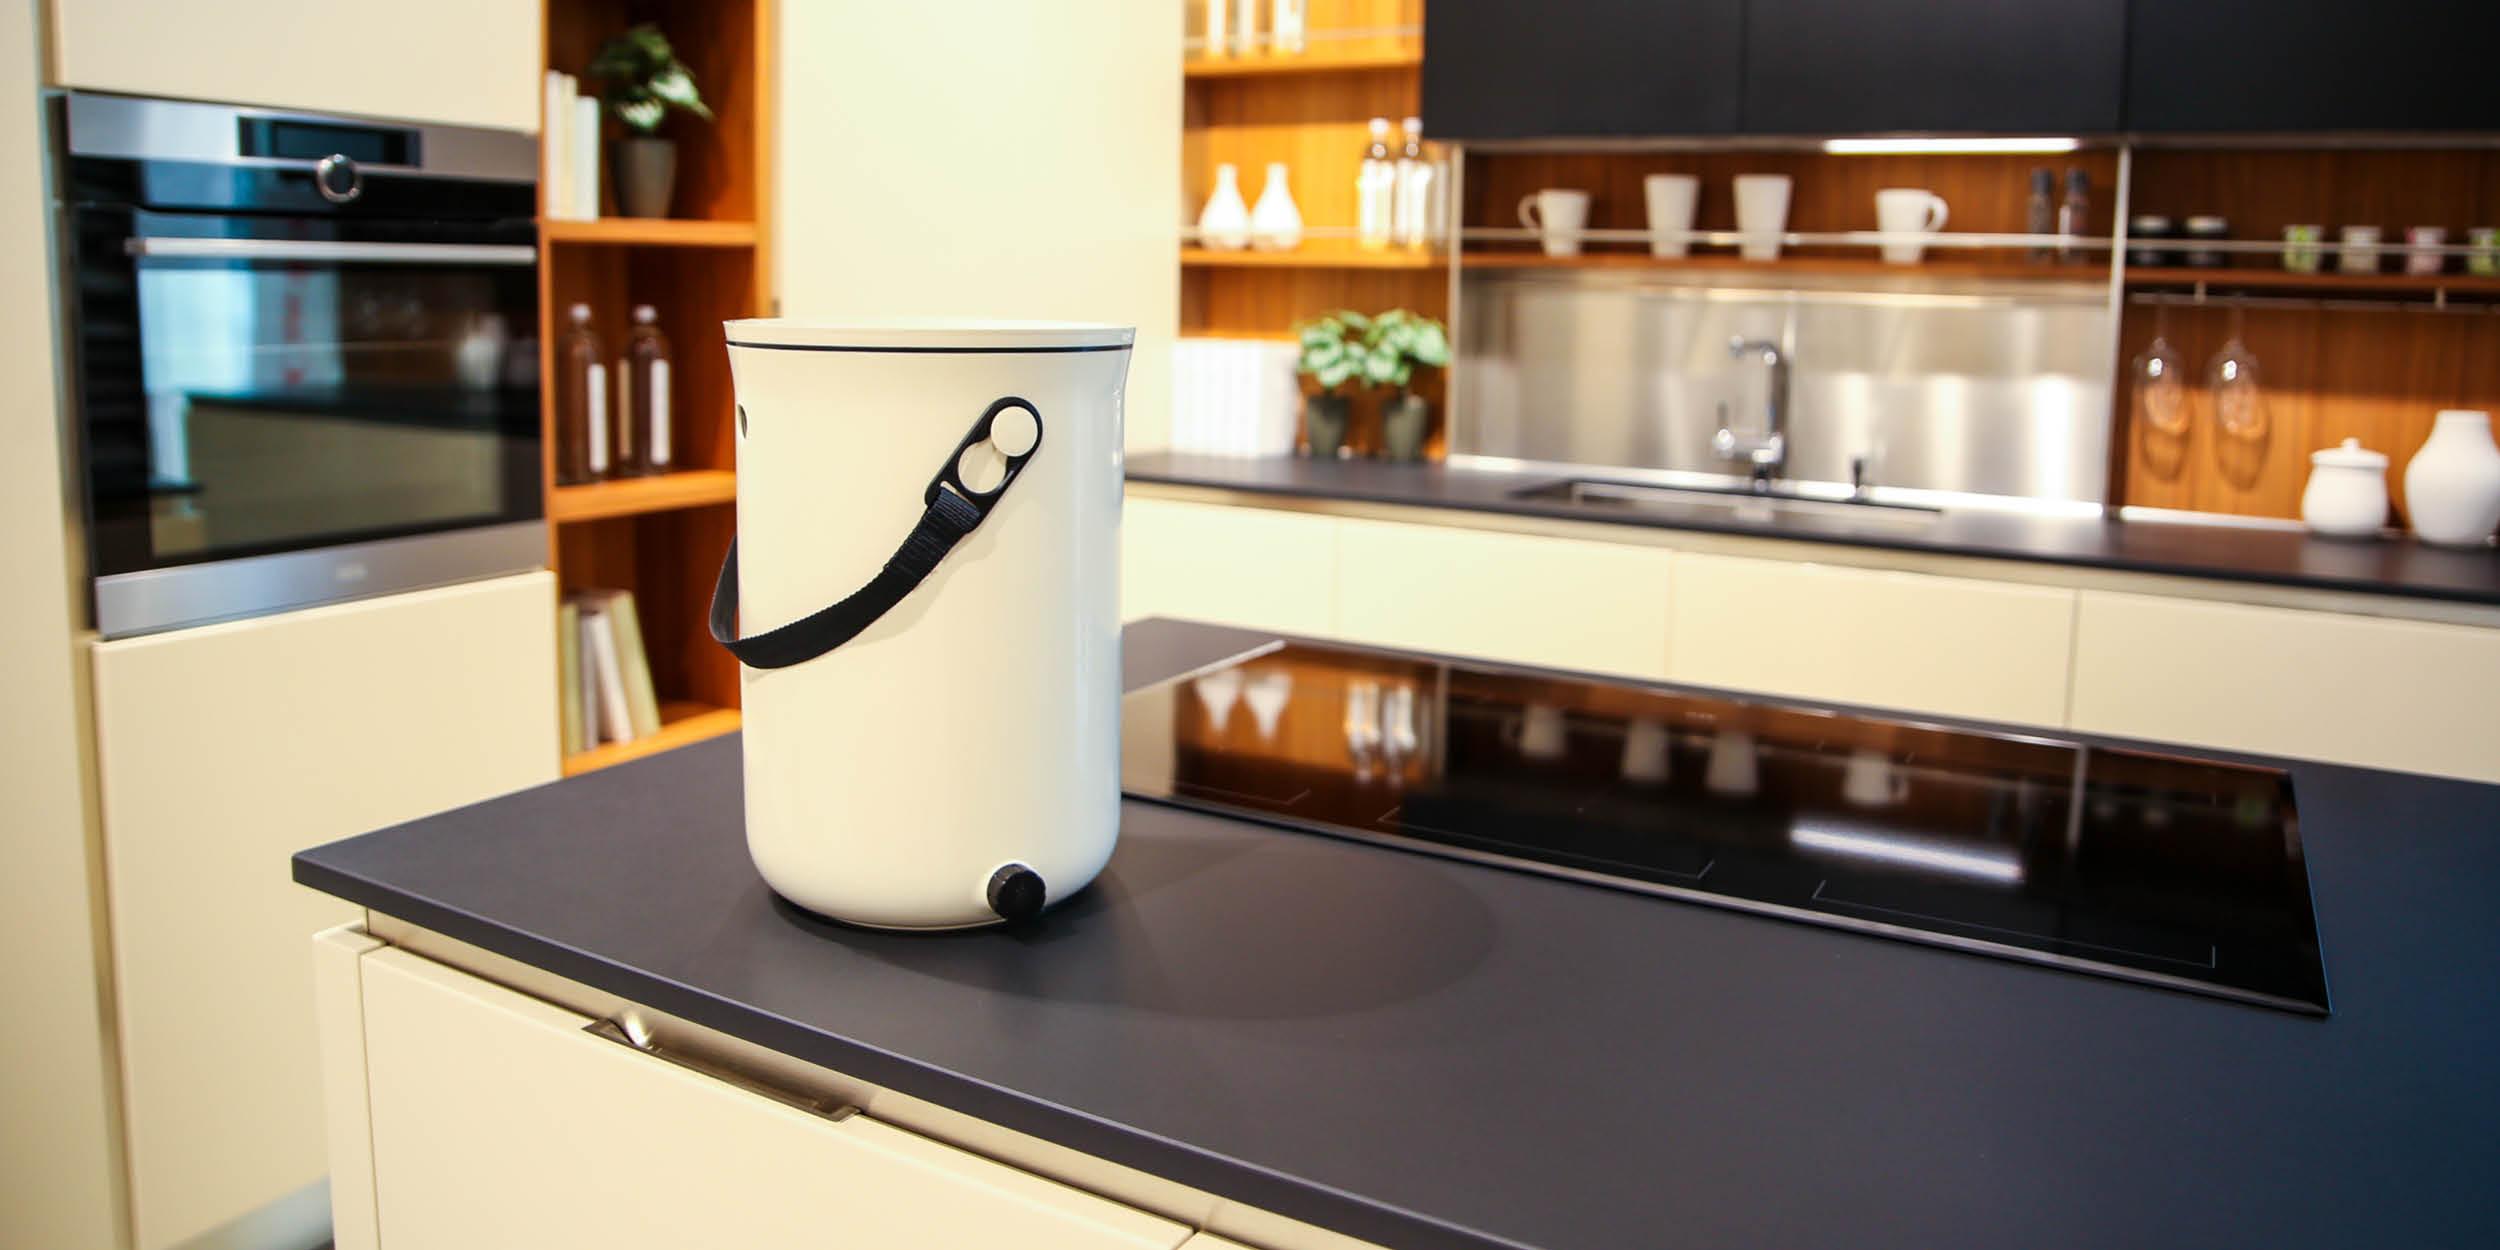 Zero-waste kitchen Say No To Wasting Organic Waste